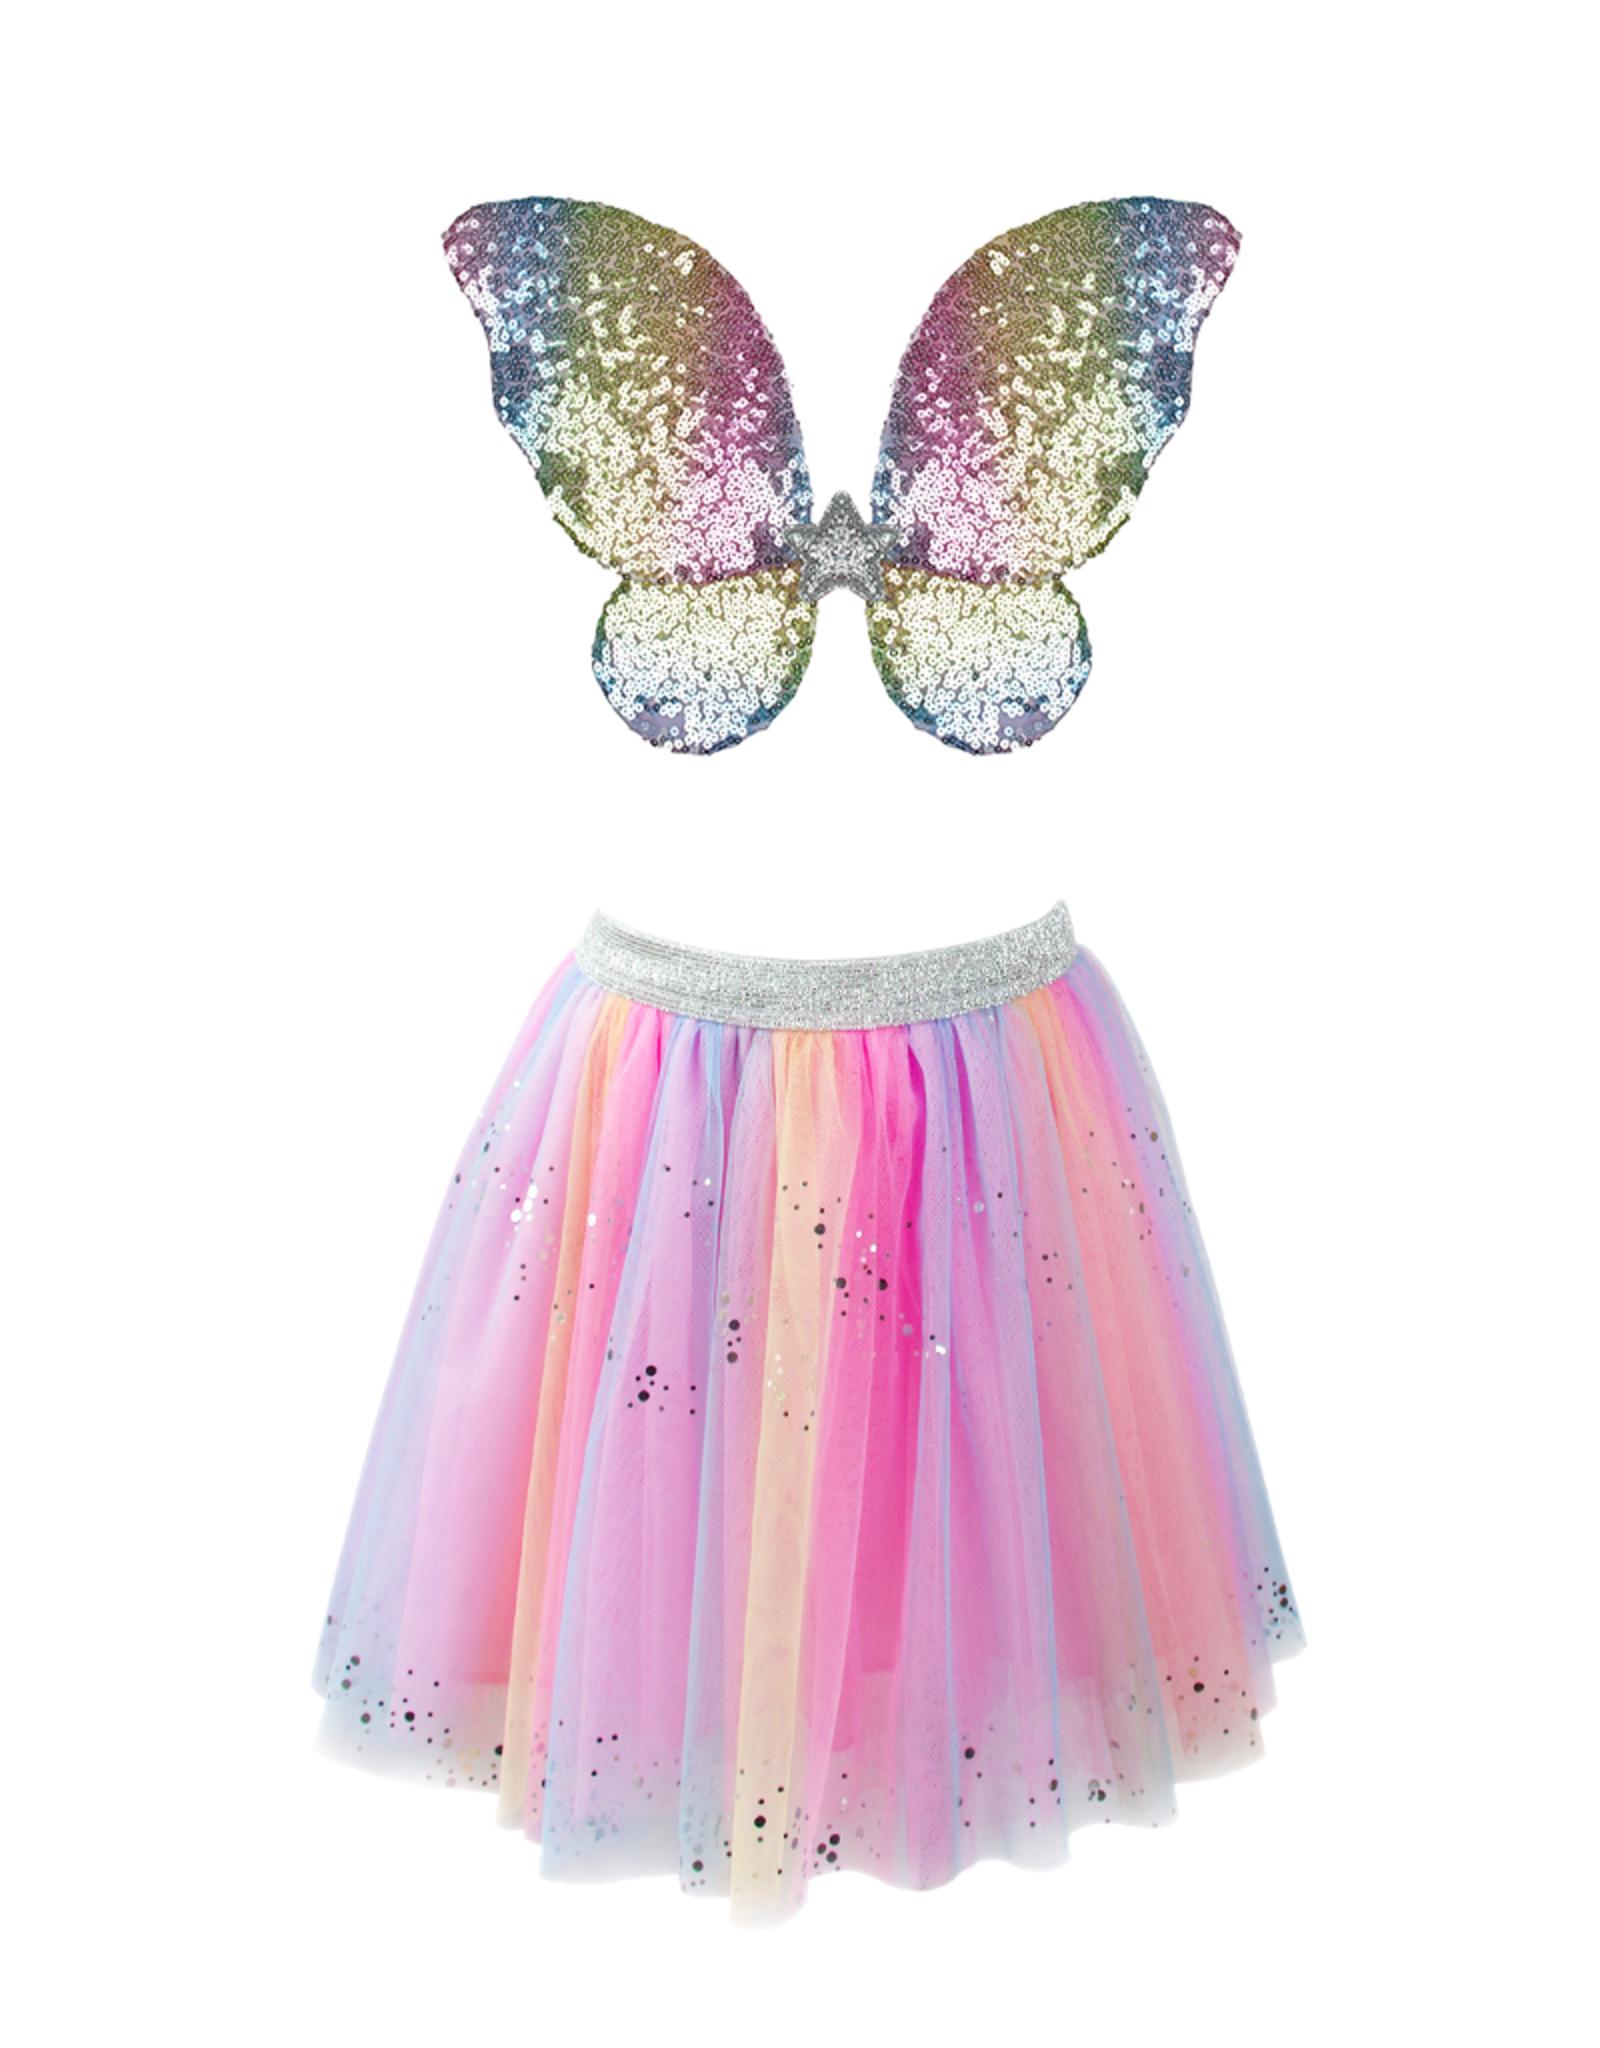 Rainbow Sequin Skirt/Wings & Wand Sz 4-6